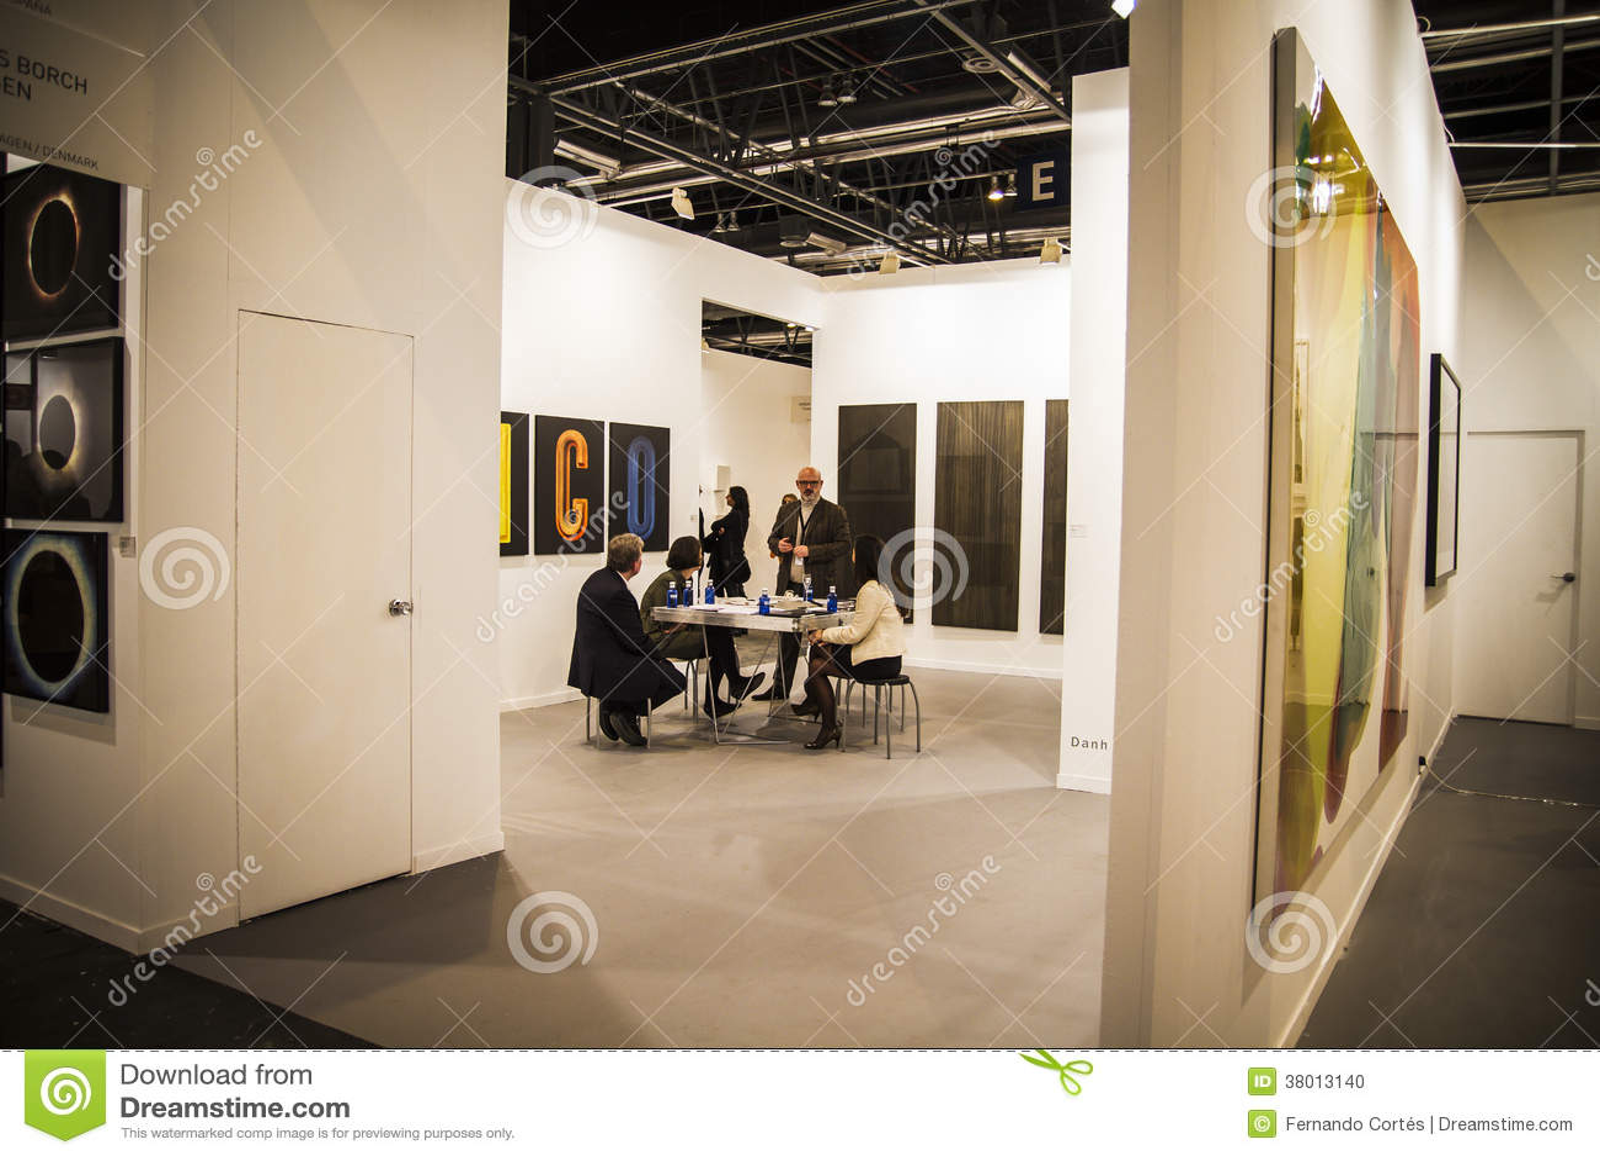 Sculpture.Begins 2014 ARCO, a arte contemporânea internacional F